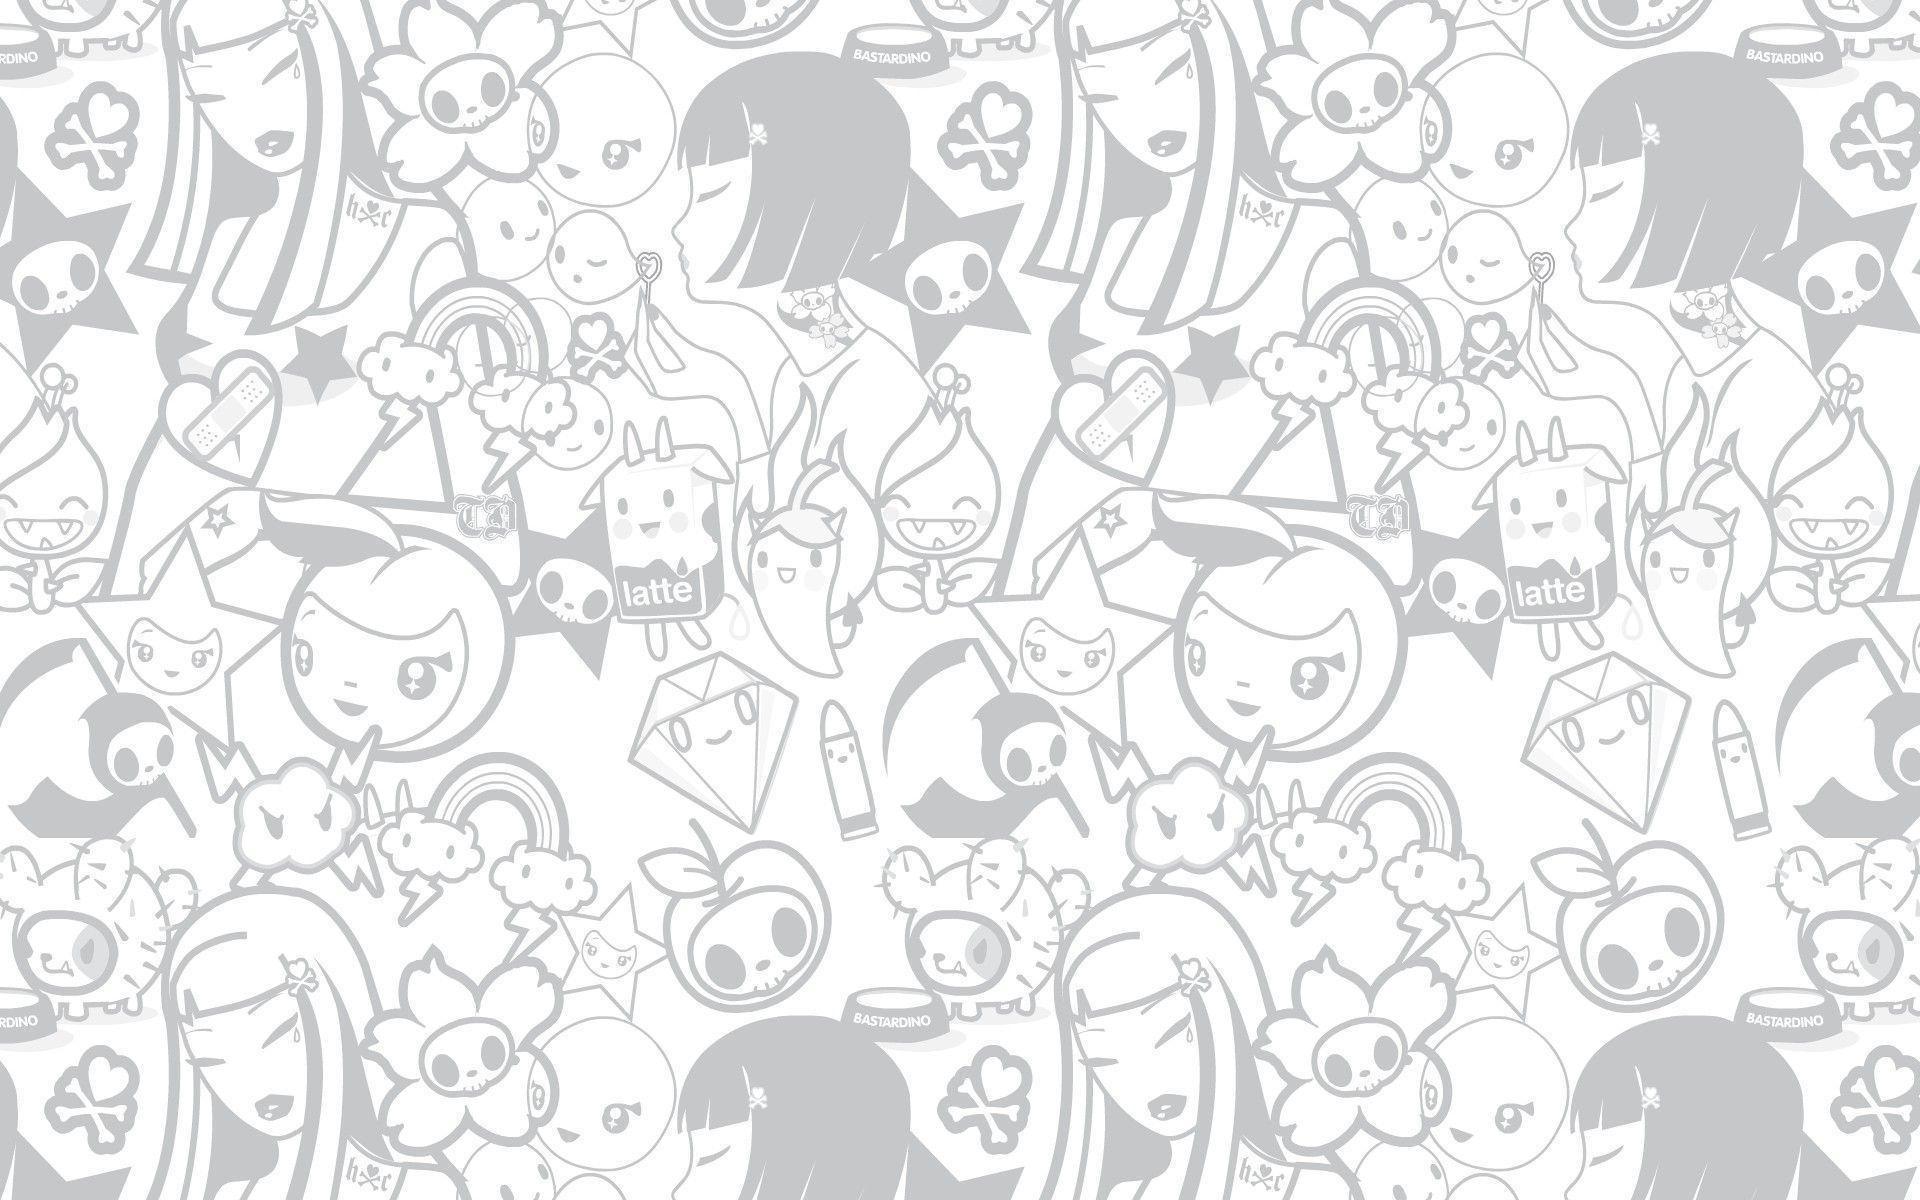 Kawaii background wallpaper 66 images - Kawaii wallpaper hd ...